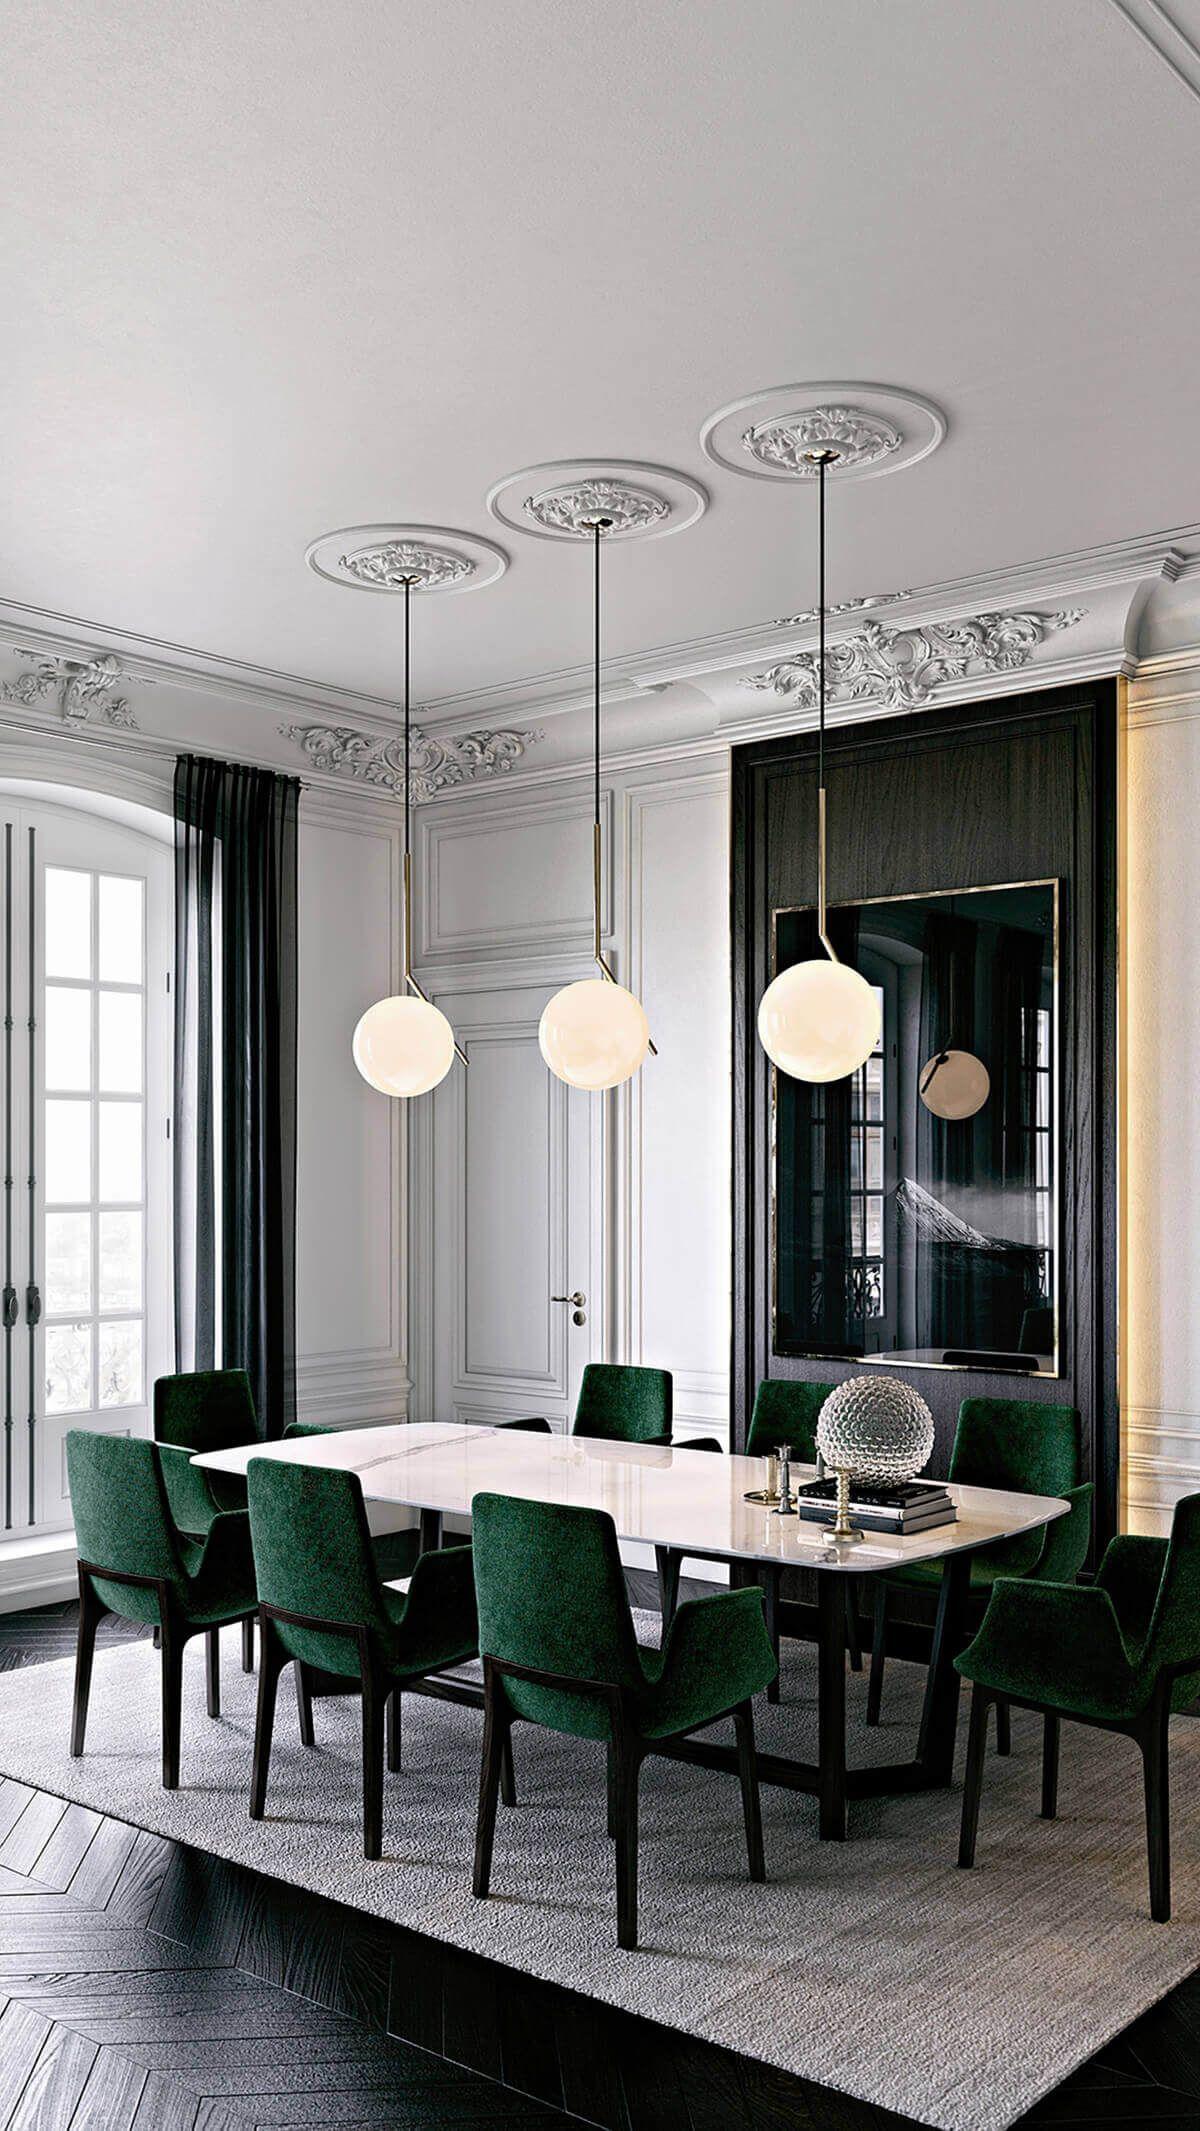 An Intro To The Parisian Art Deco Style Idee Sala Da Pranzo